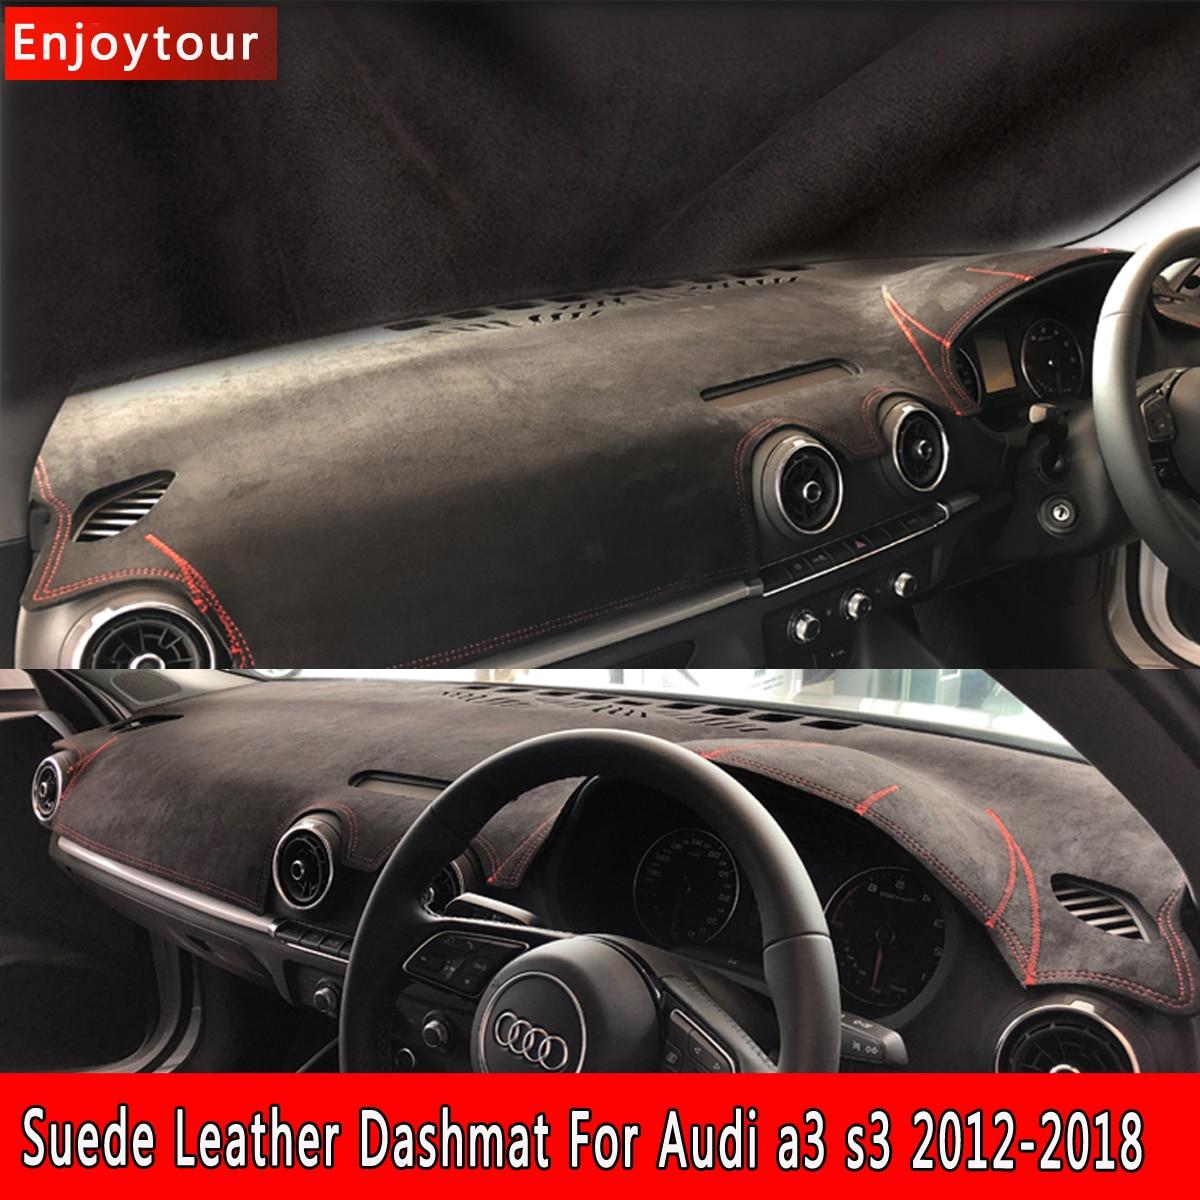 Car Styling Suede Leather Dashmat Dashboard Cover Pad Dash Mat Carpet For Audi A3 S3 Sportback 2012 2015 2016 2017 2018 Rhd Car Anti Dirty Pad Aliexpress